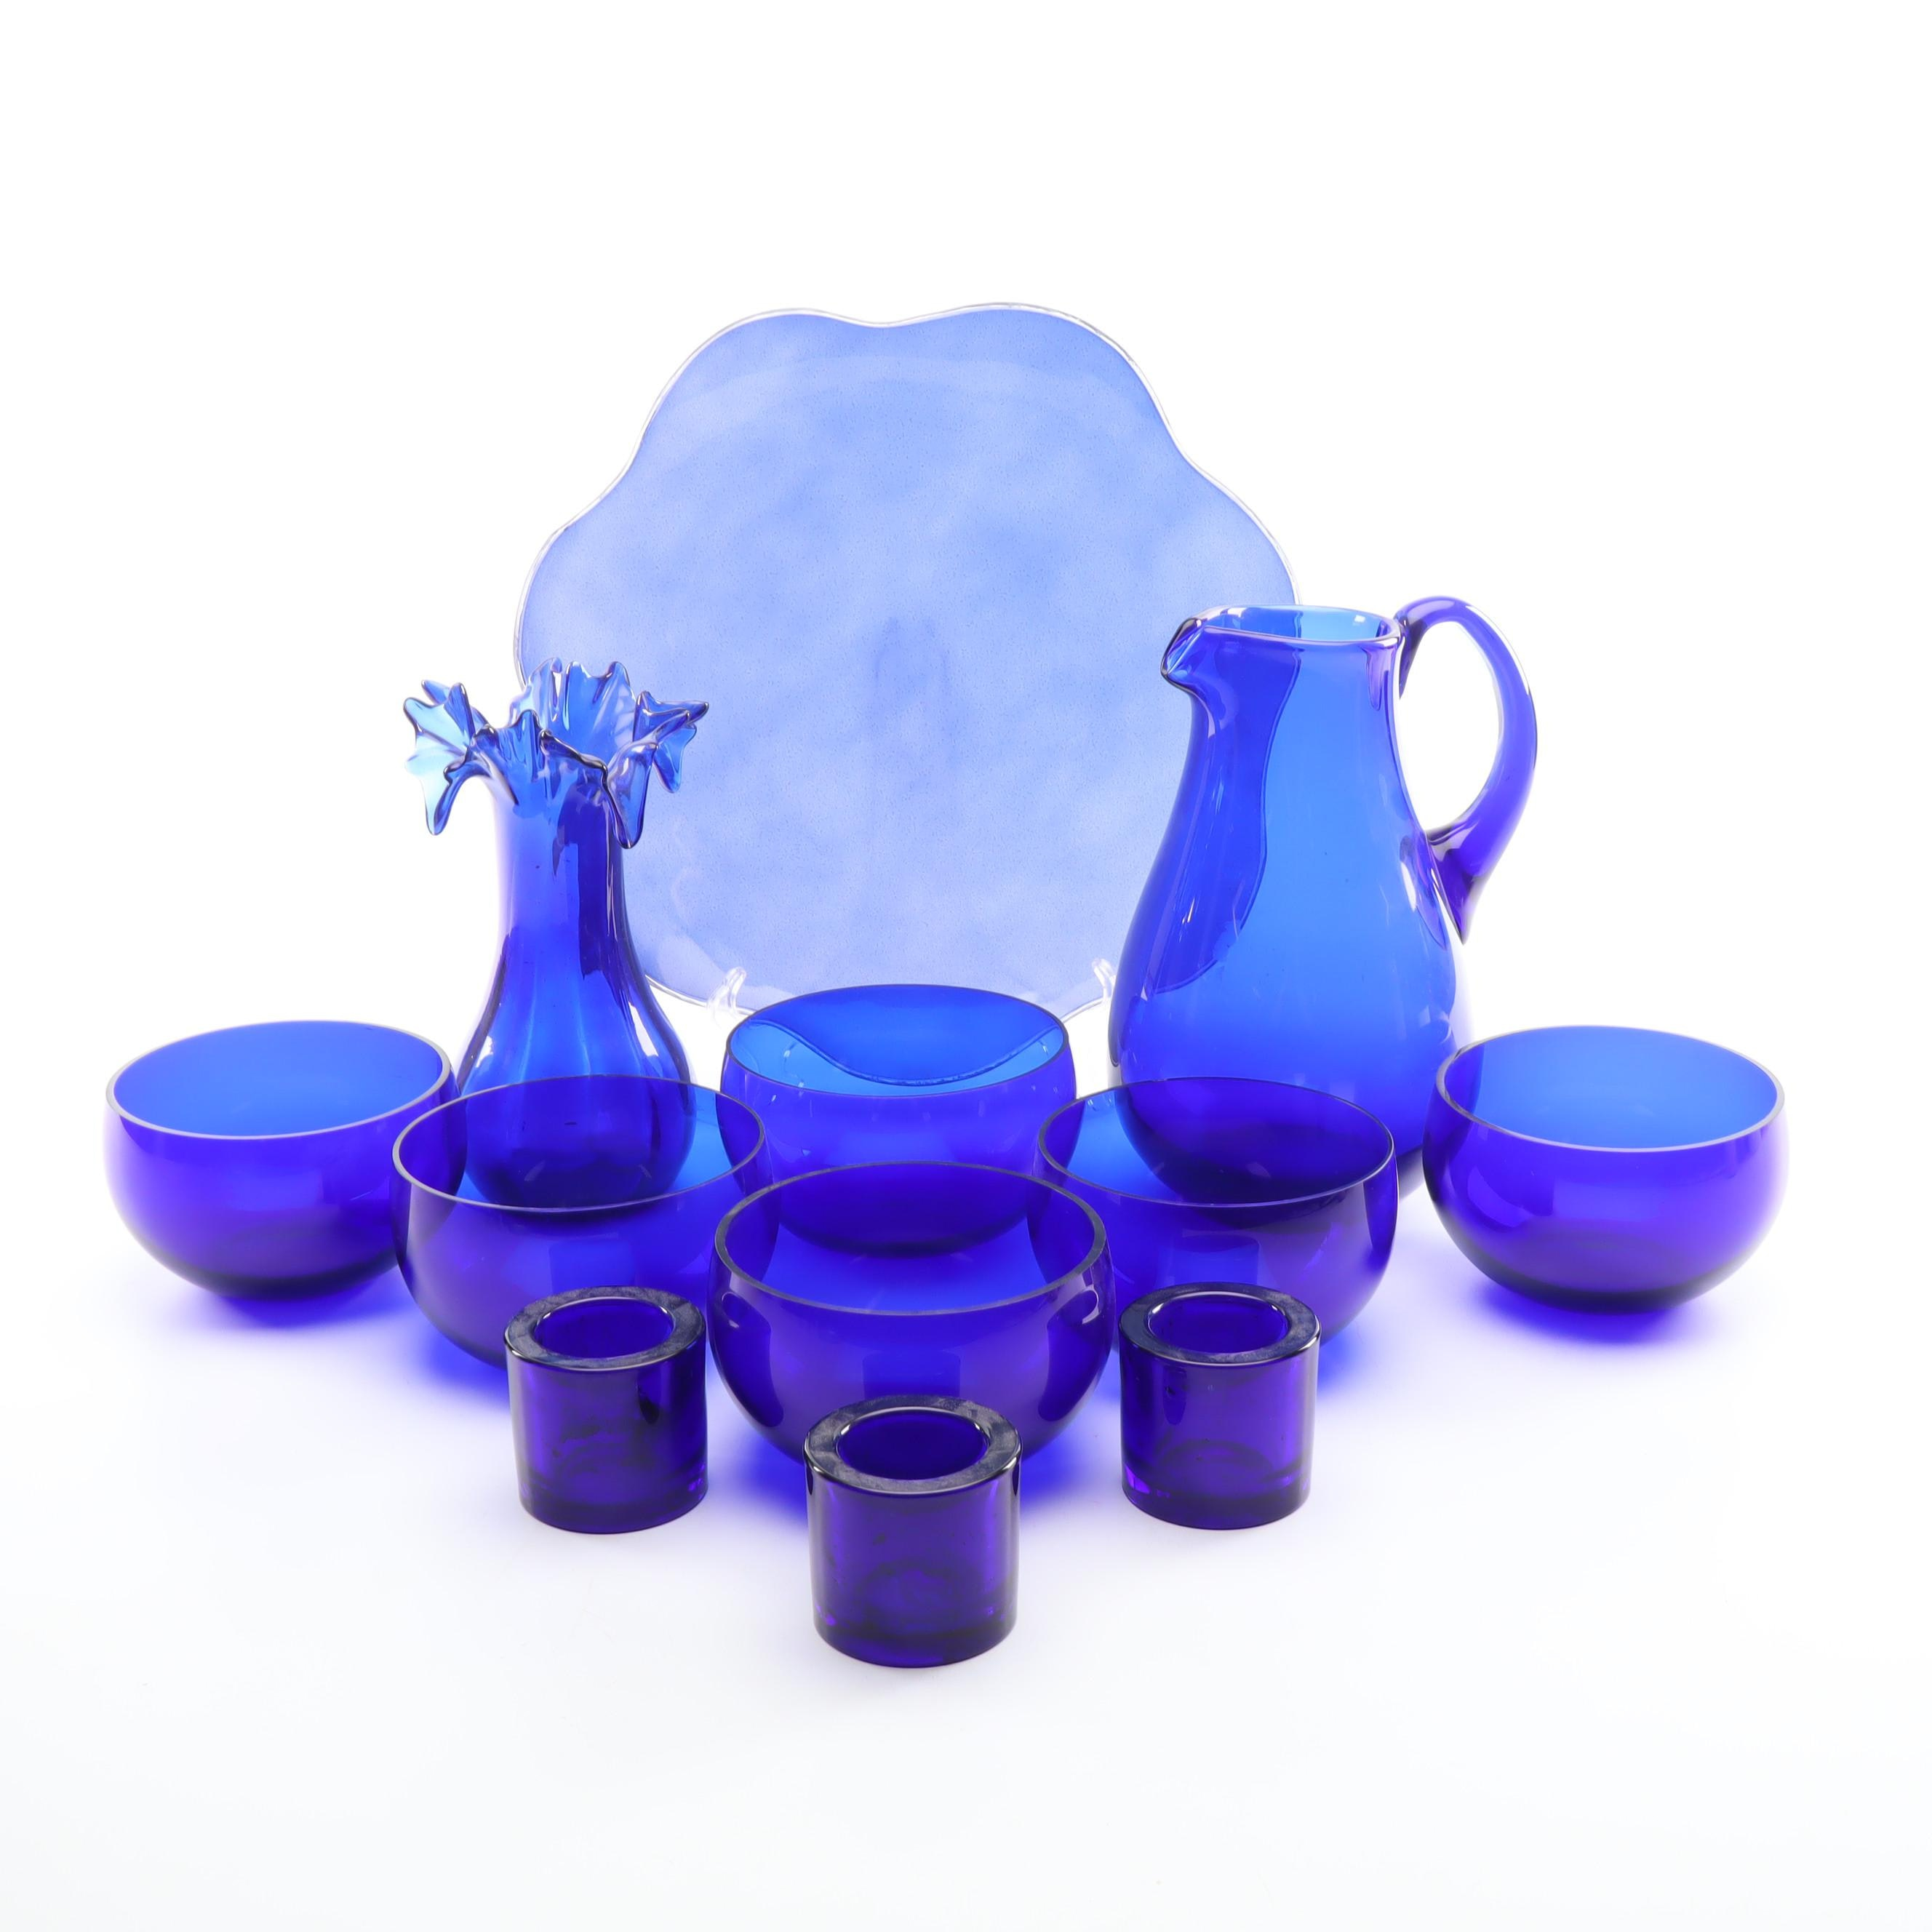 Cobalt Blue Glass Tableware Including Marimekko Votive Holders